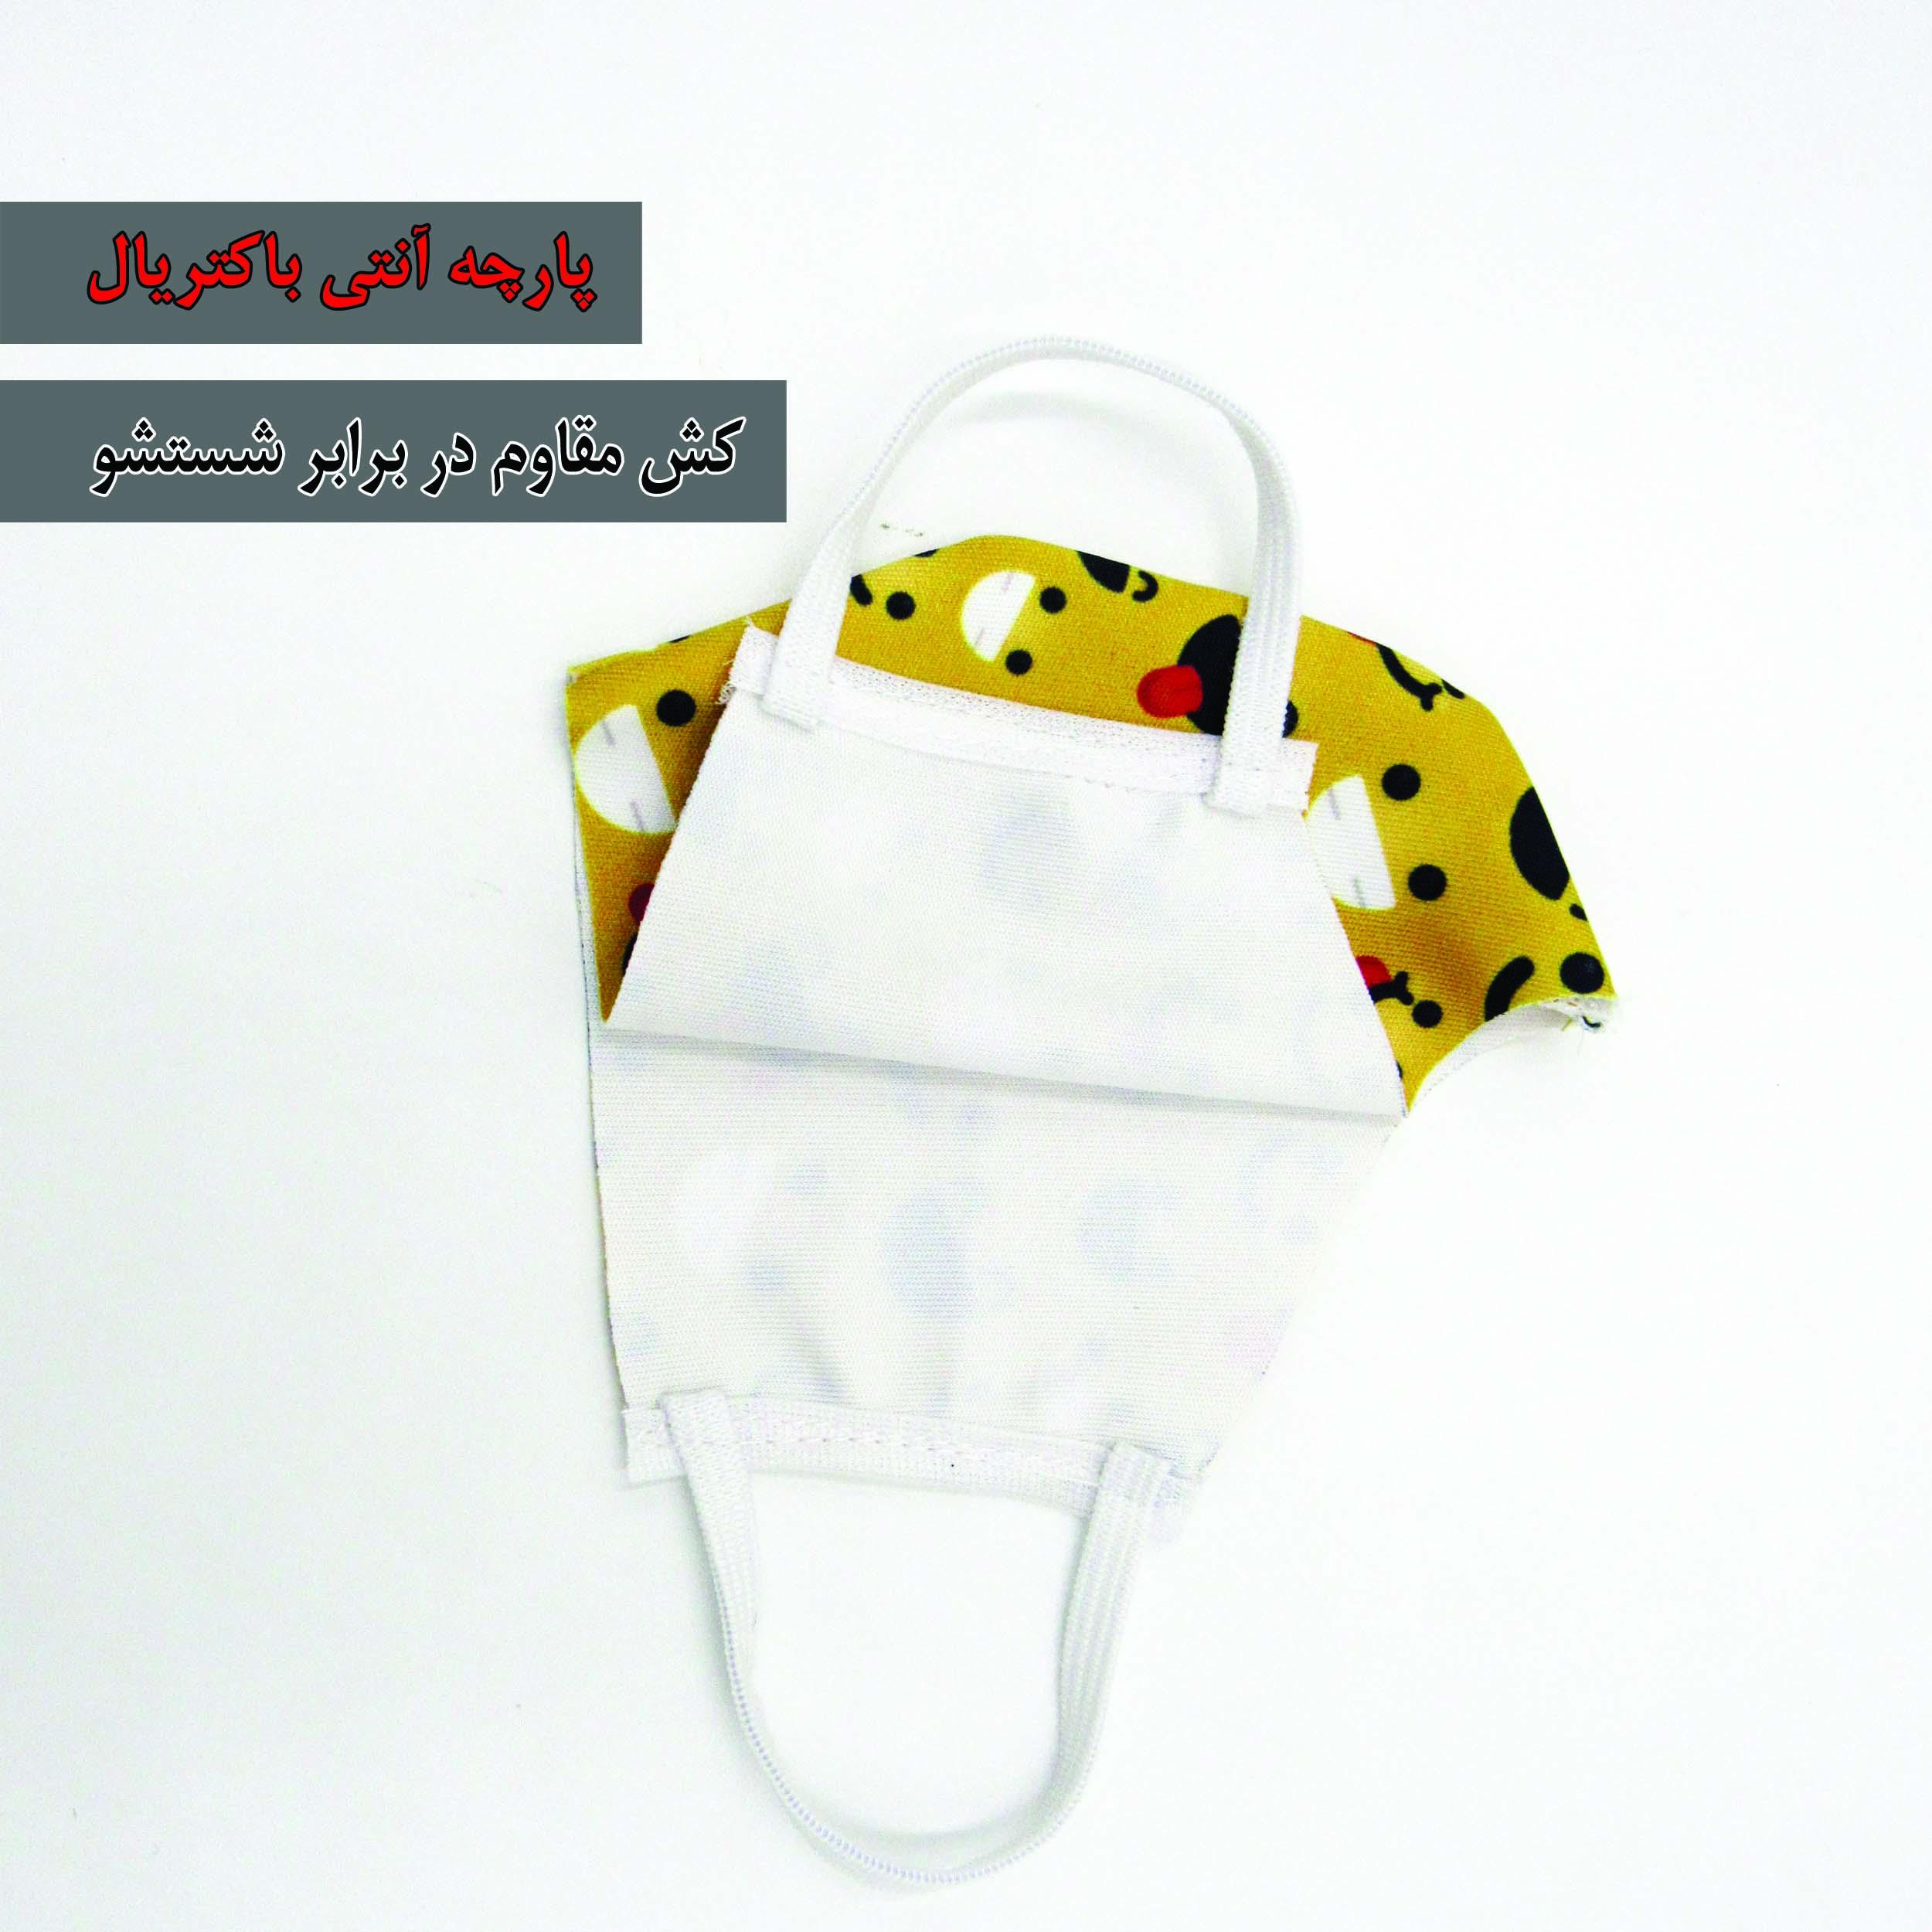 3 pcs kids reusable decorative face mask, model 001